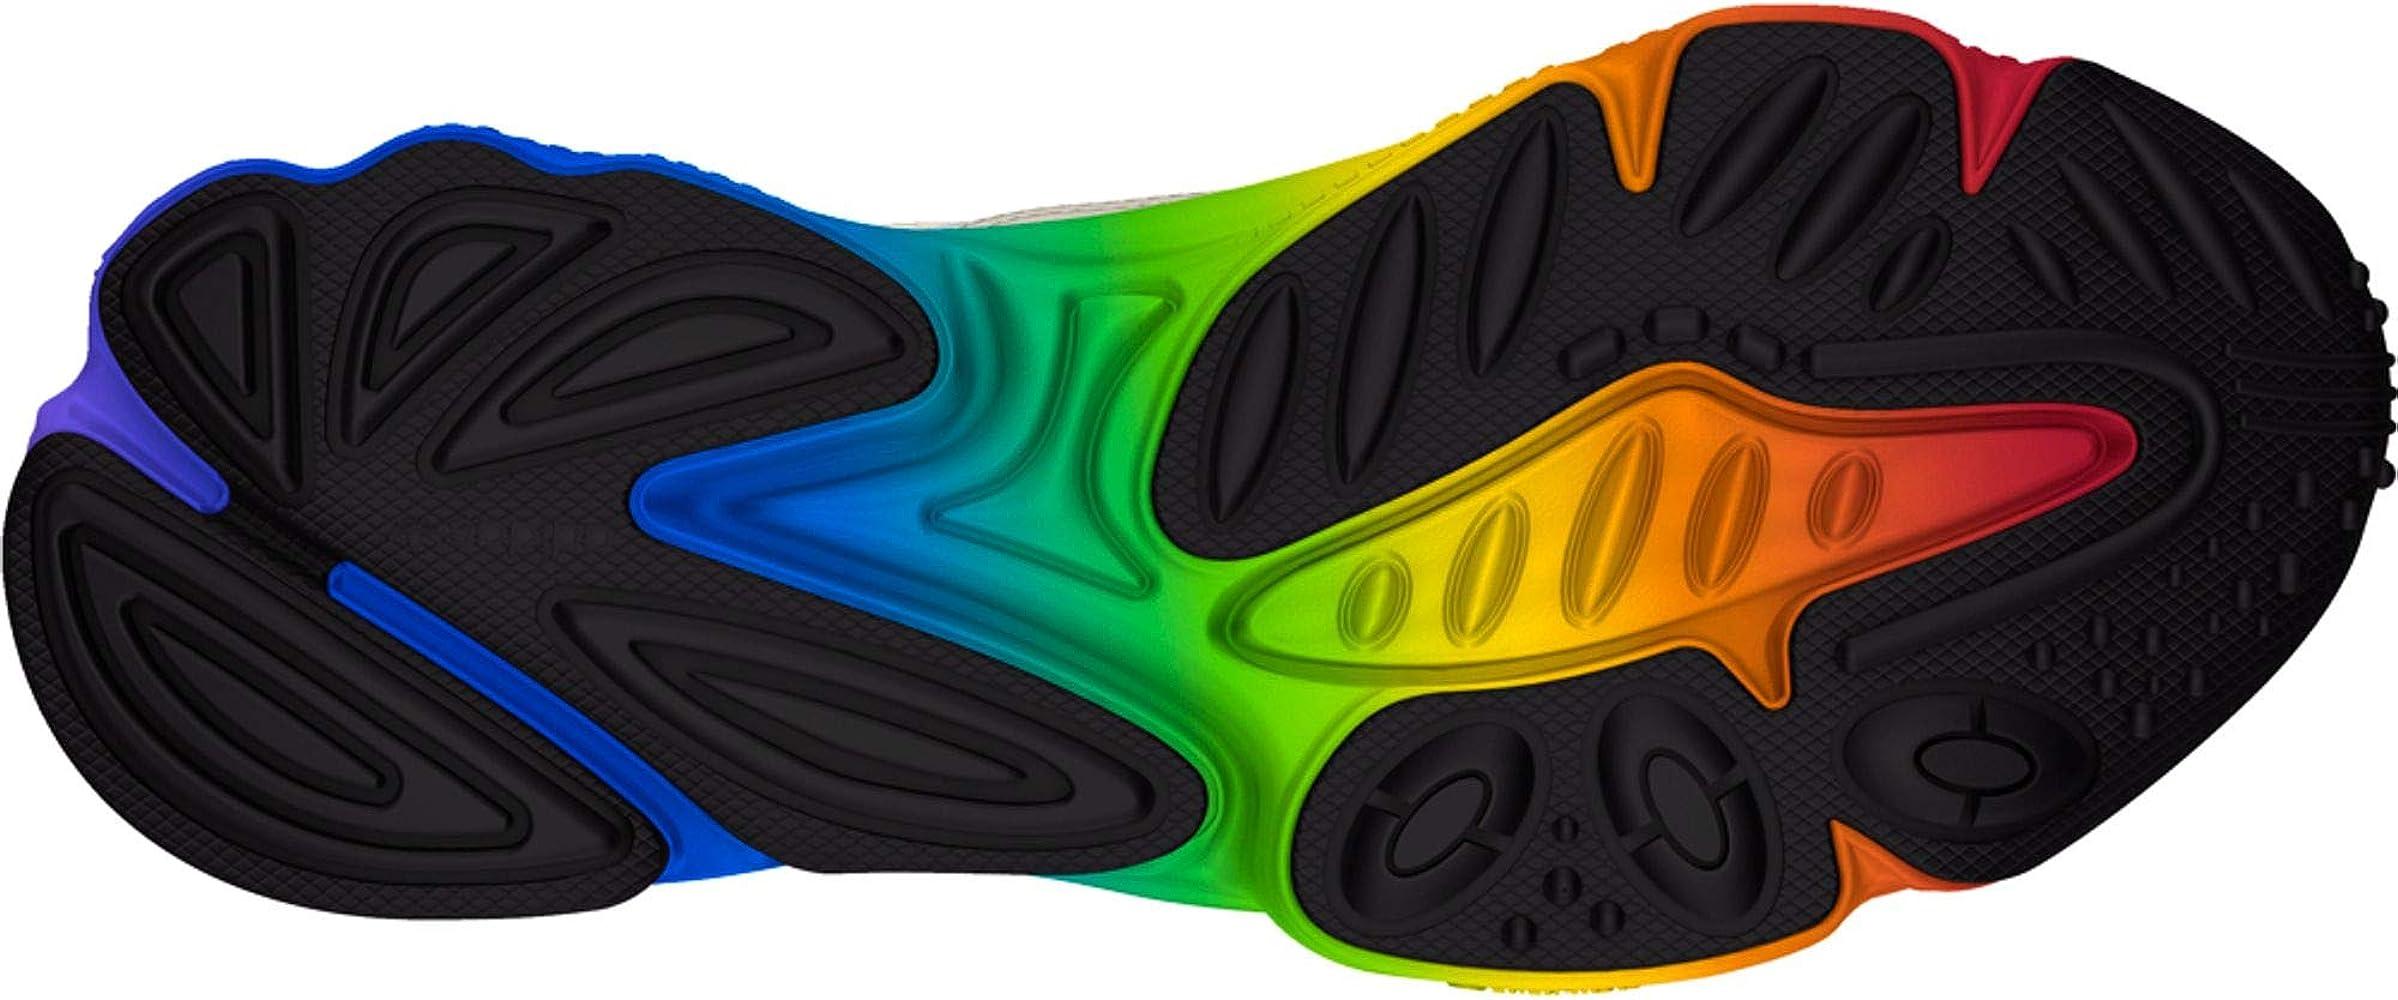 adidas Originals Homme Baskets Ozweego Pride: Amazon.fr ...